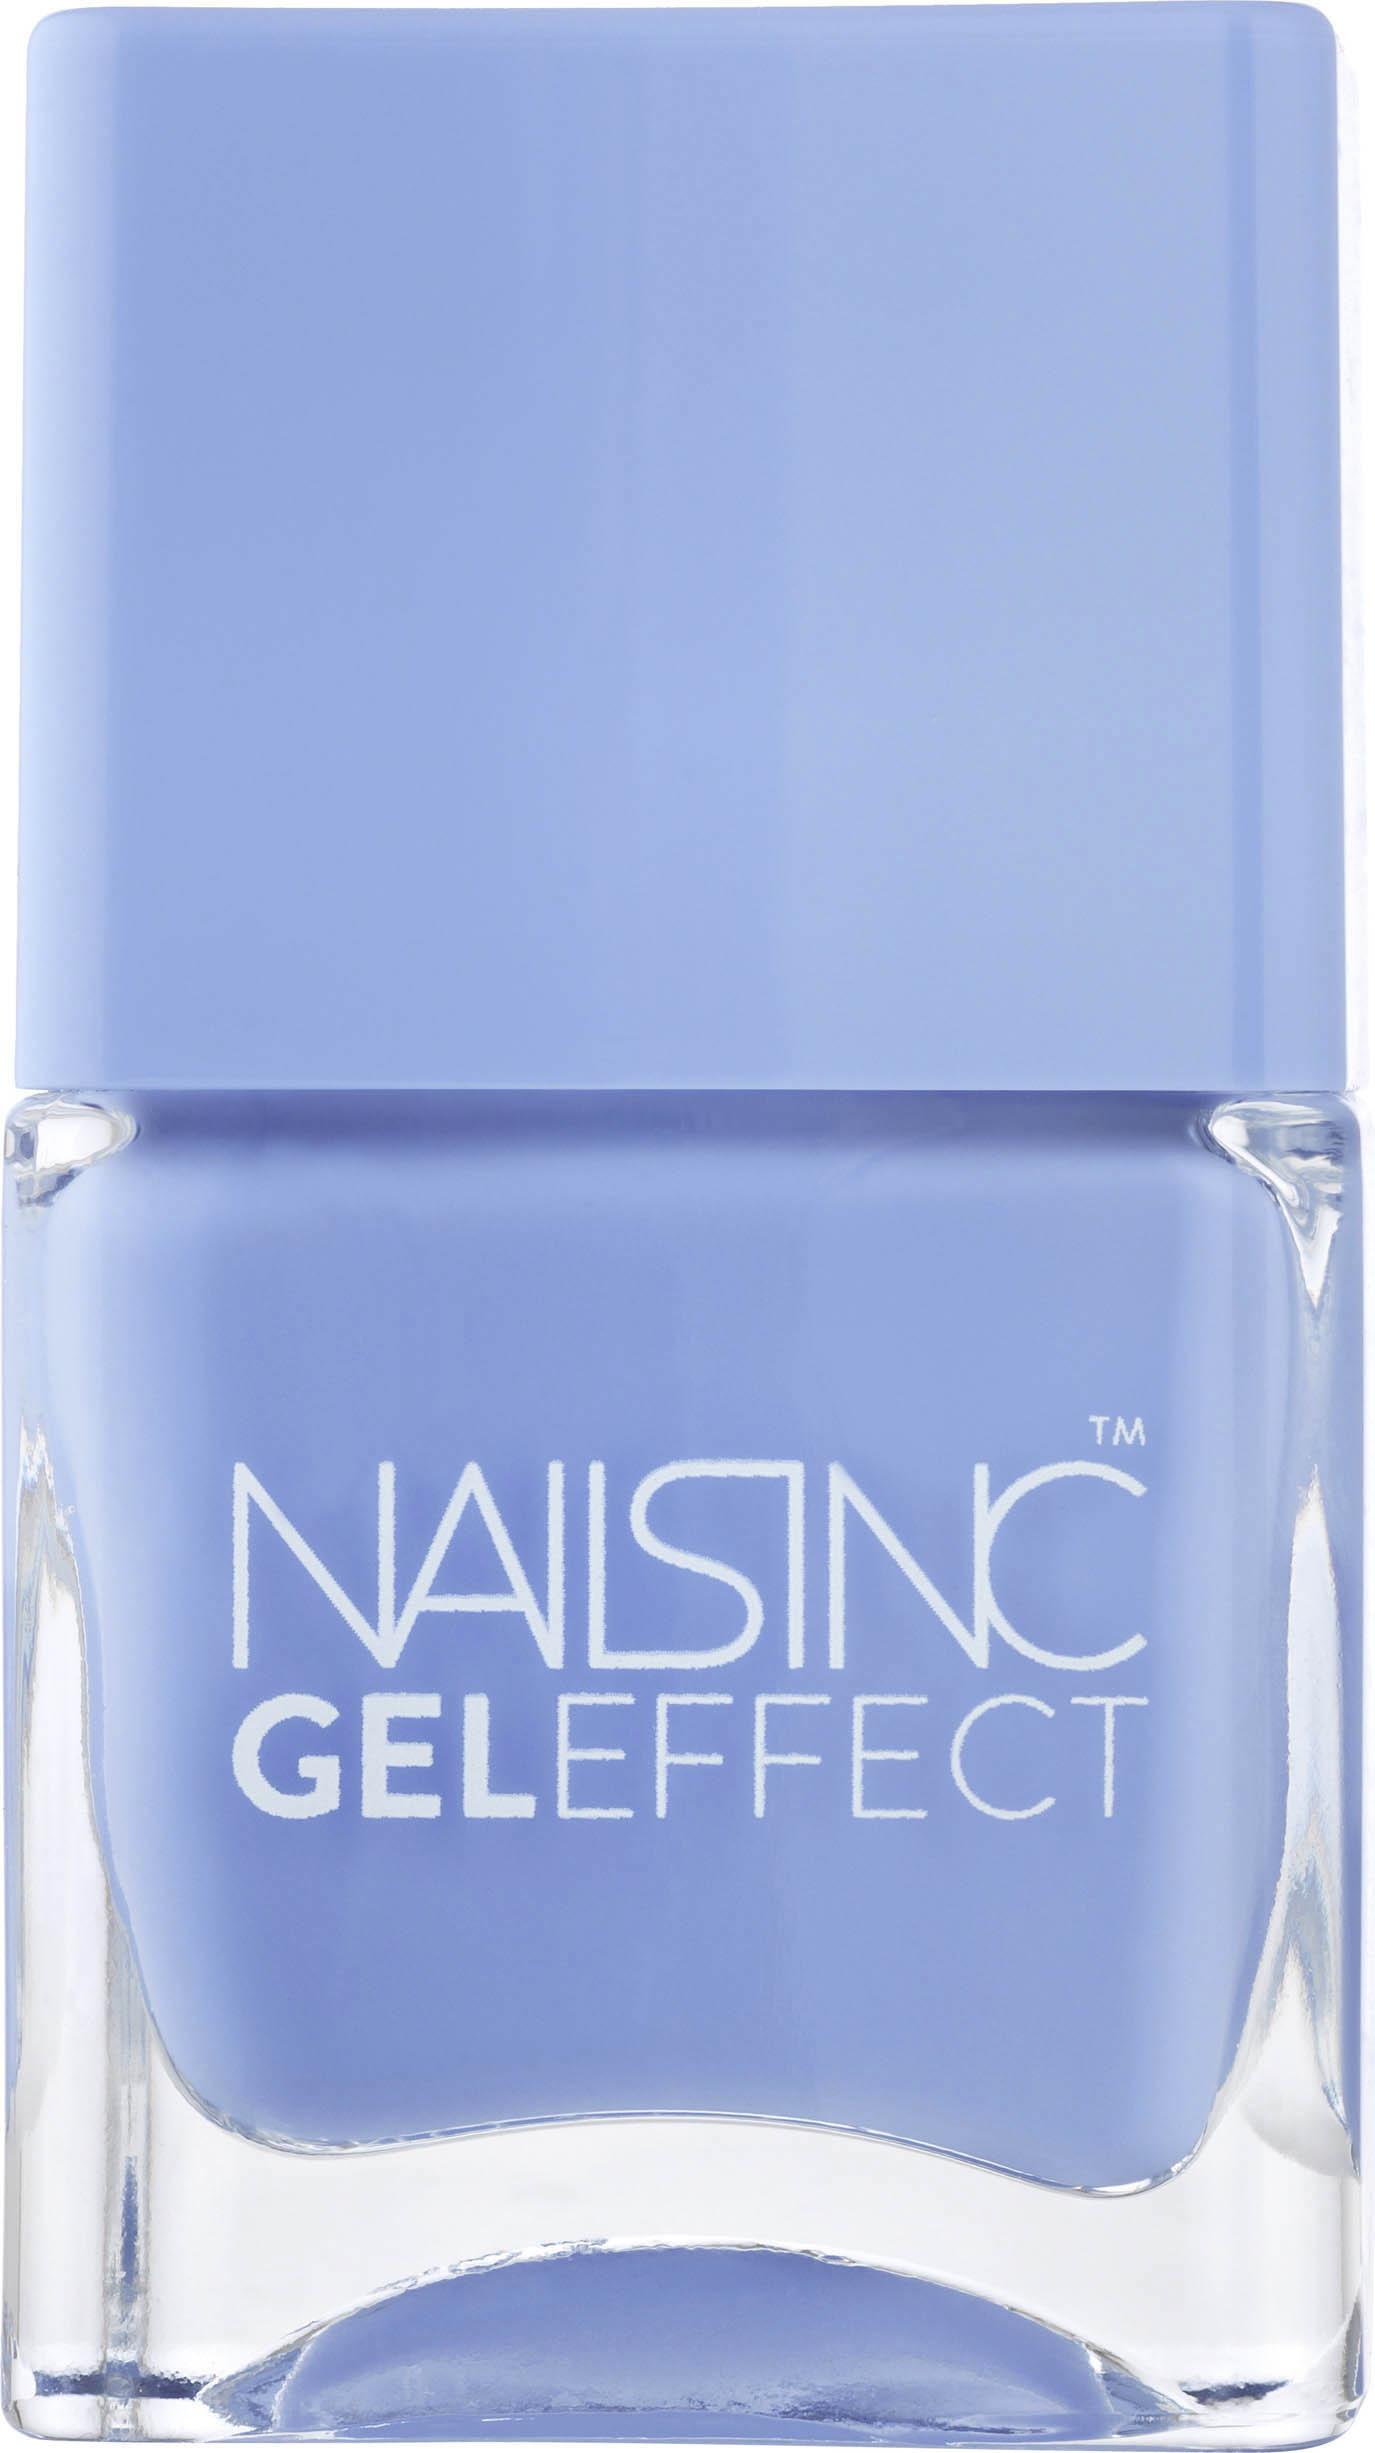 Nails Inc - Gel Effect Nail Lacquer 14 ml - Regents Place